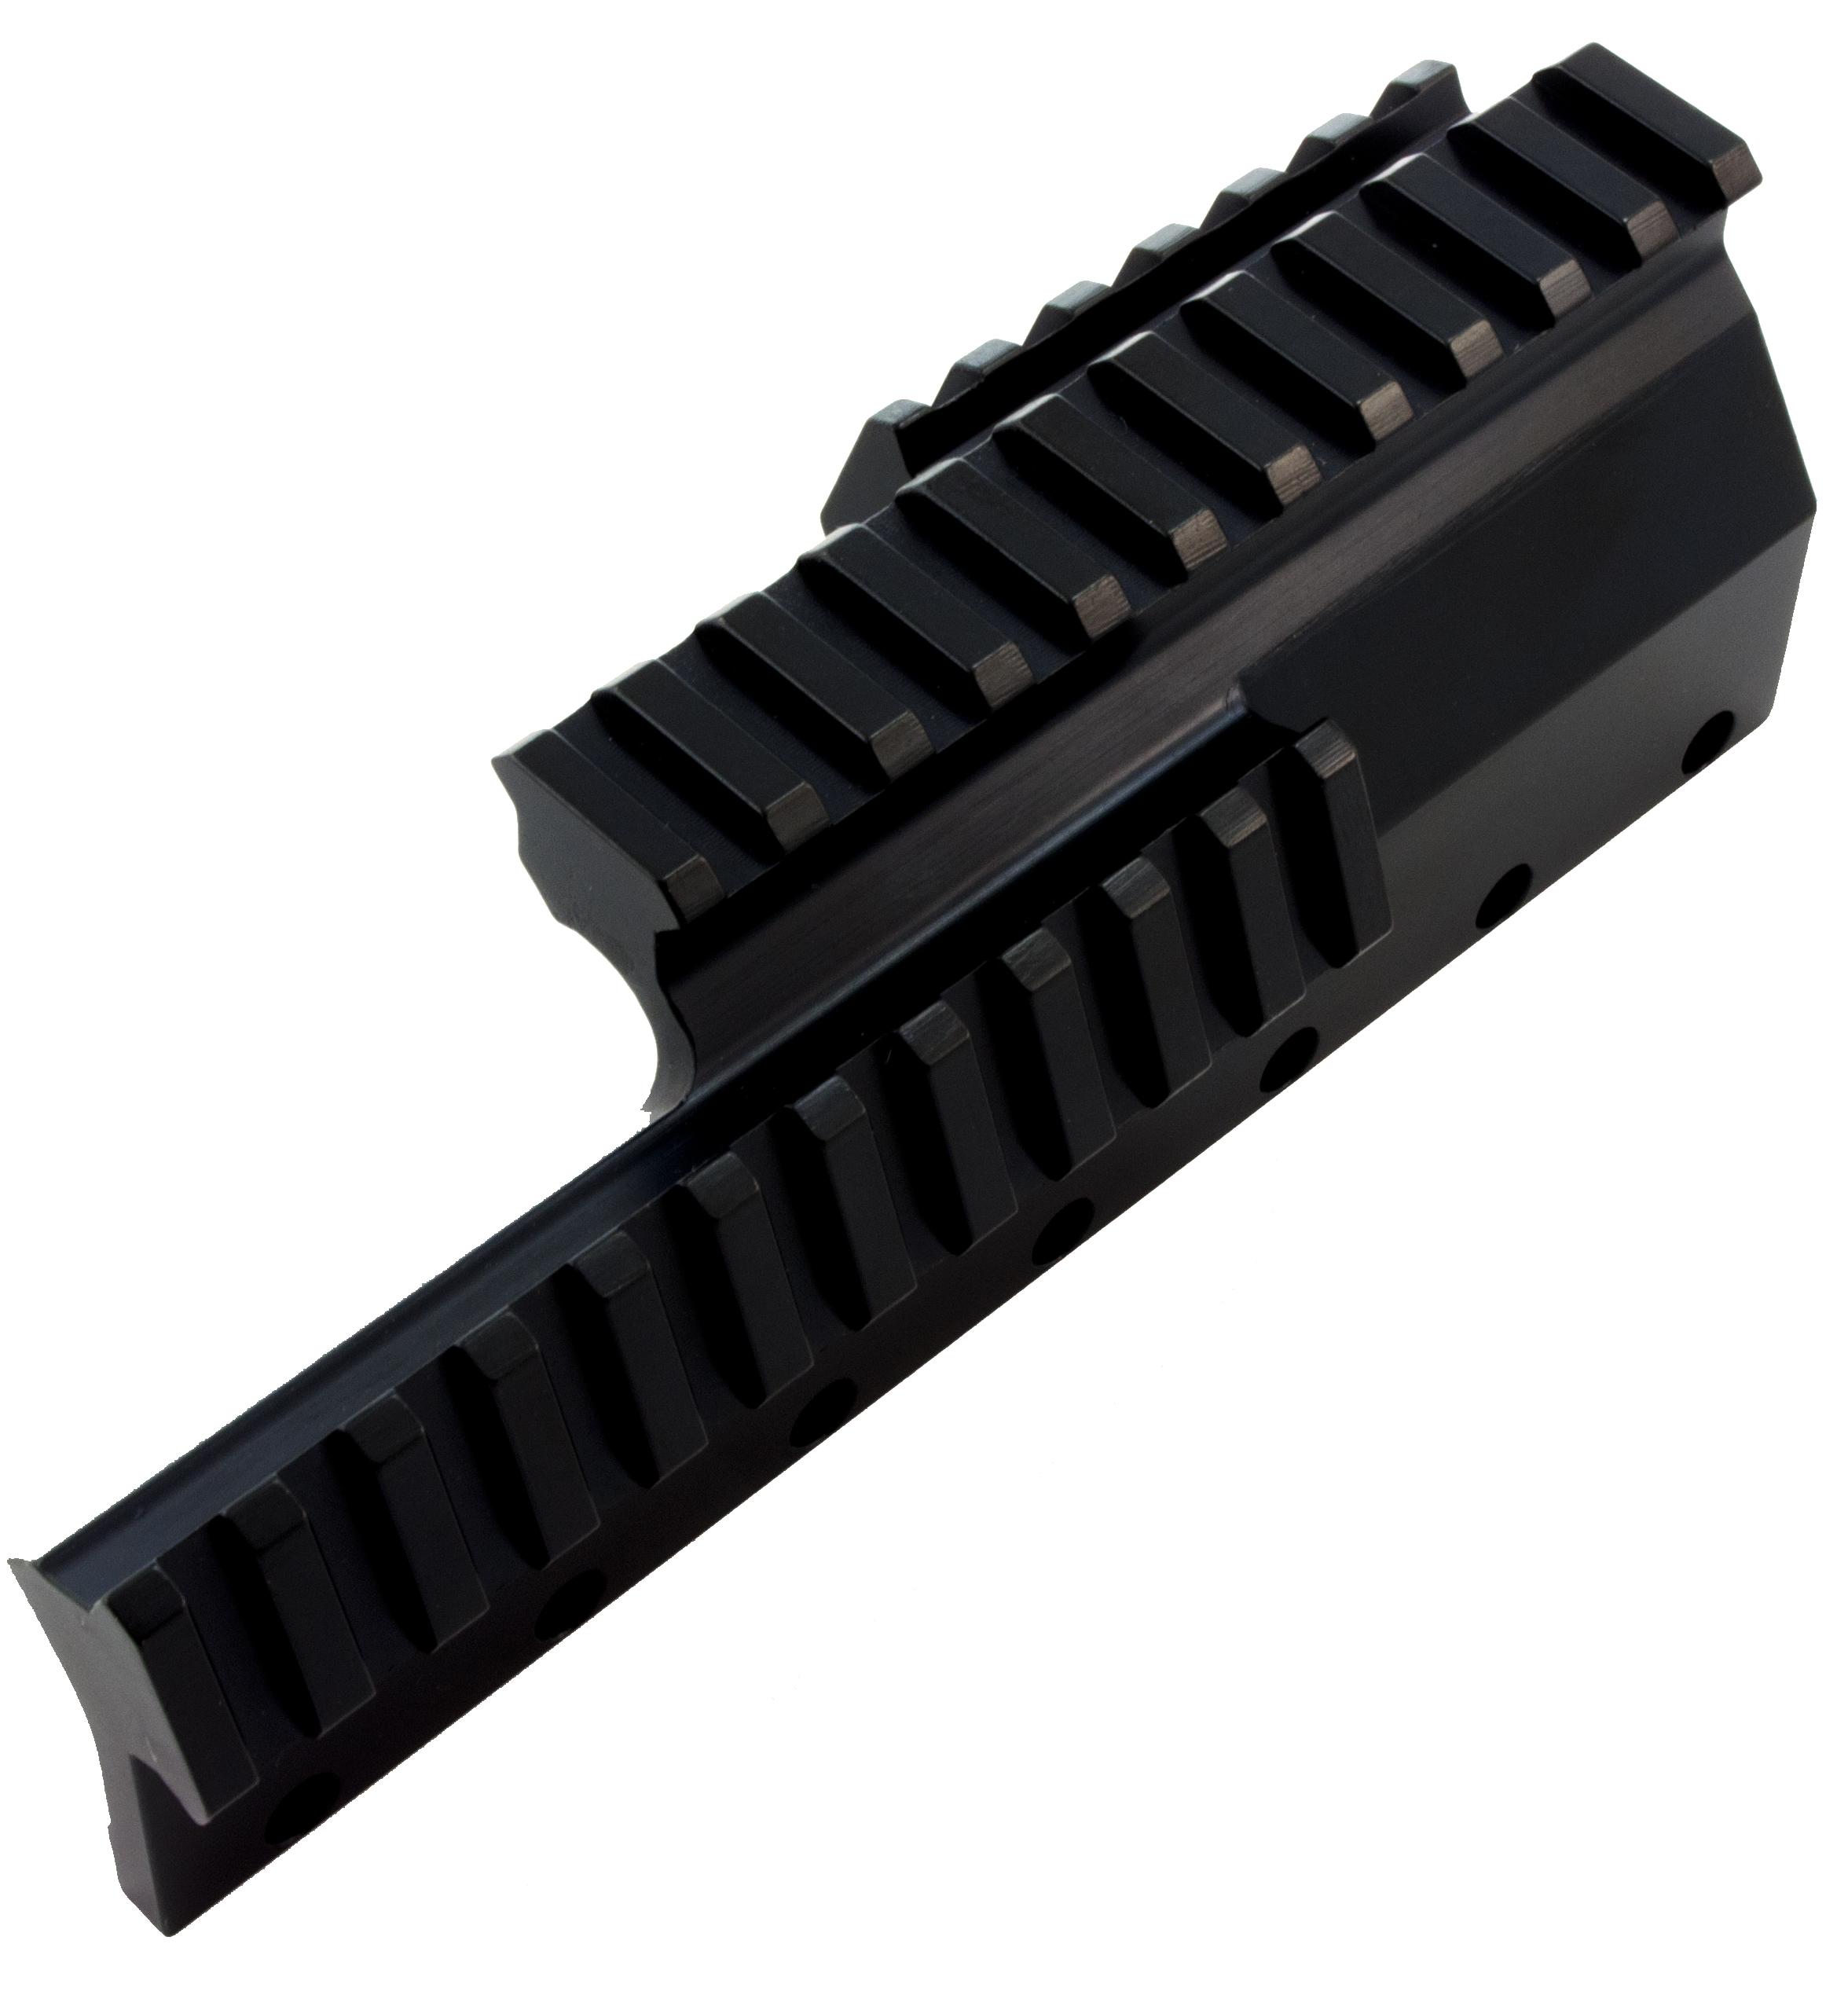 Sks picatinny rail drill amp tap scope mount addley precision